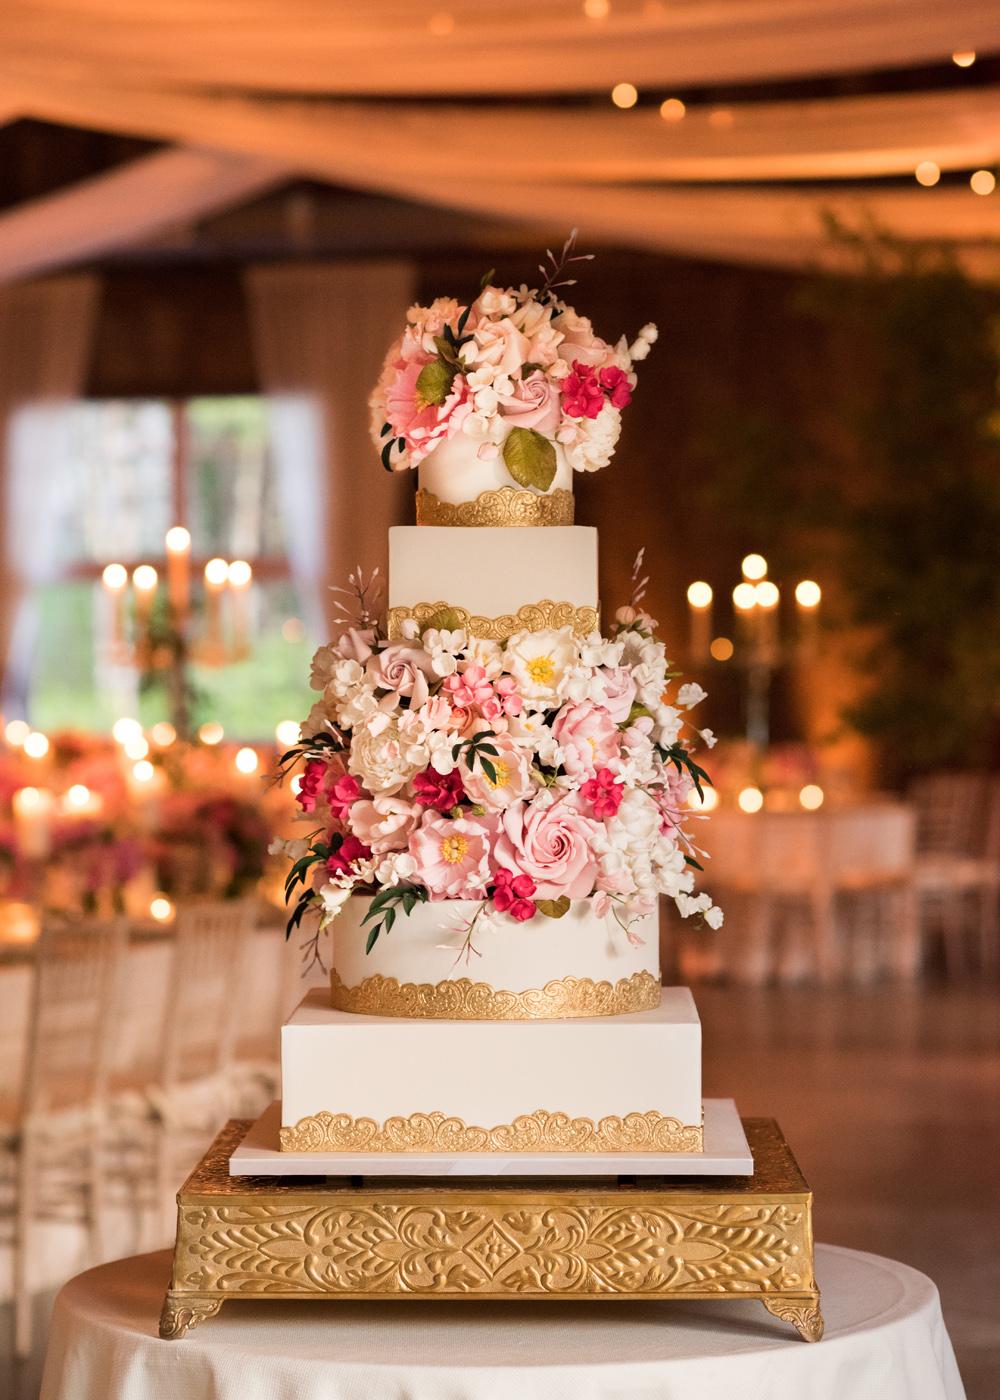 Pretty square cake design wedding cake ideas gold details fresh flowers